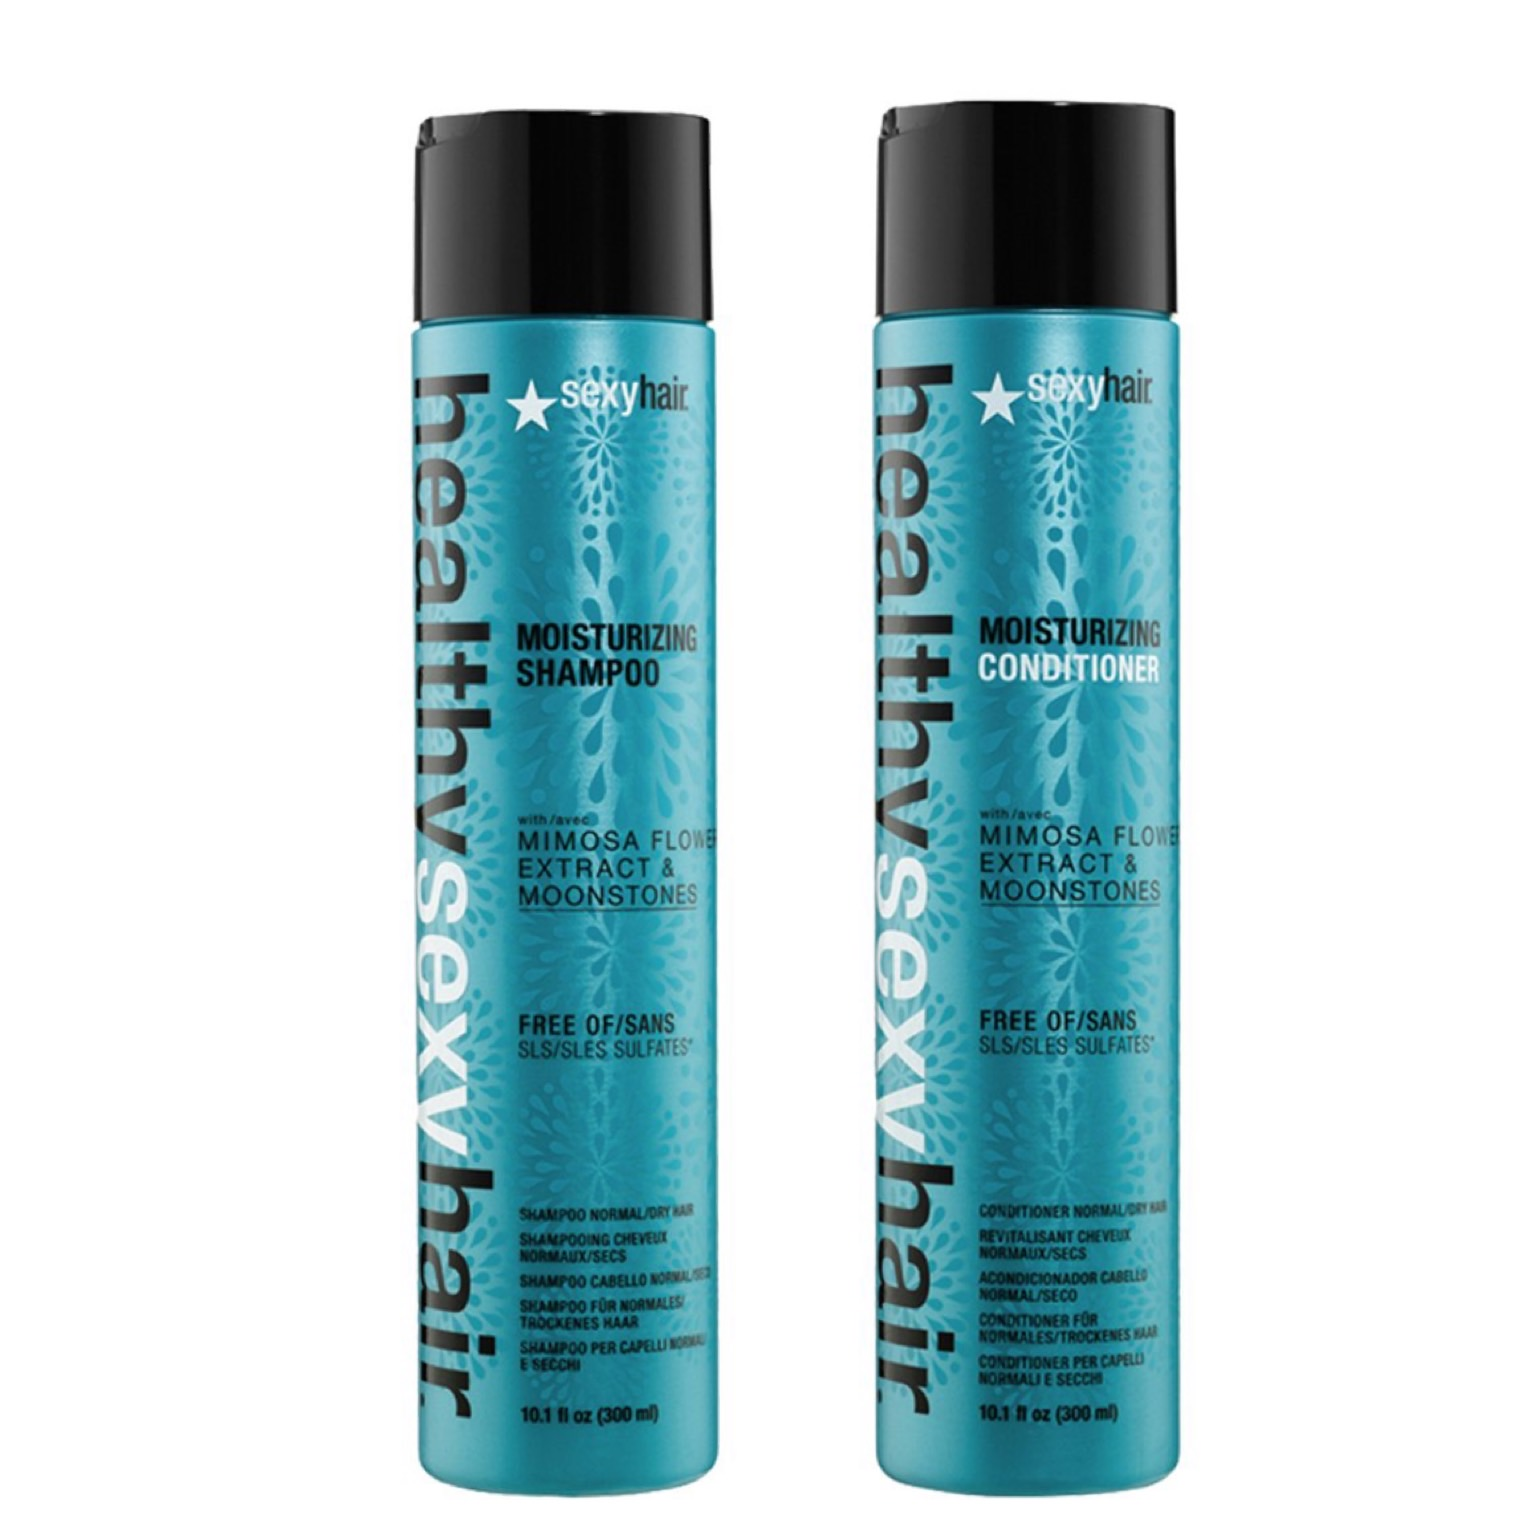 Healthy Sexy Hair Moisturizing Set - Moisturizing Shampoo 300ml + Moisturizing Conditioner 300ml